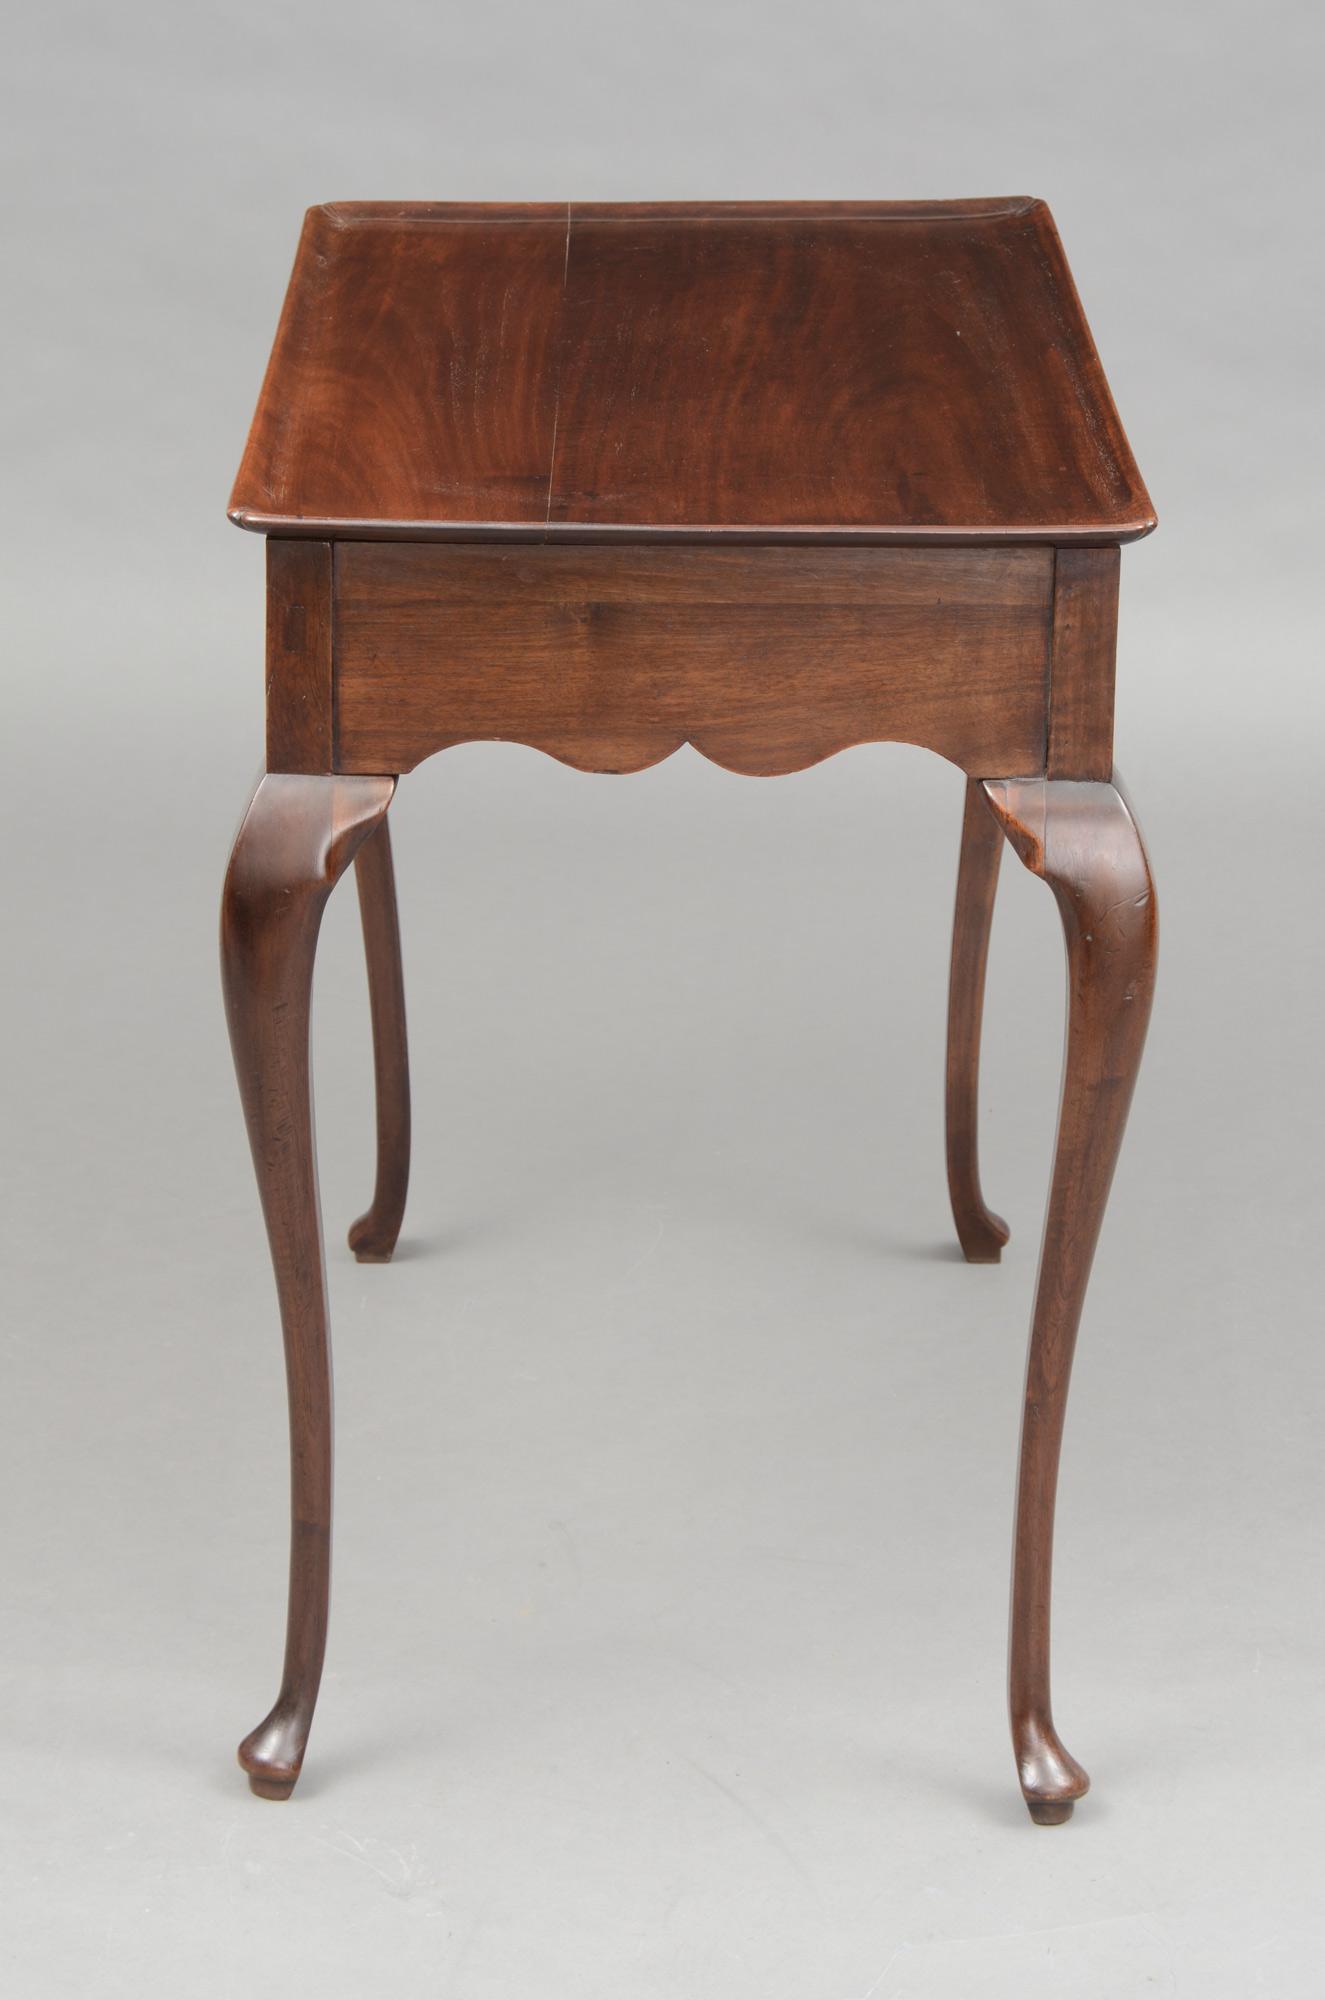 Antique Tea Tables Antique Dutch Period Tray Top Silver